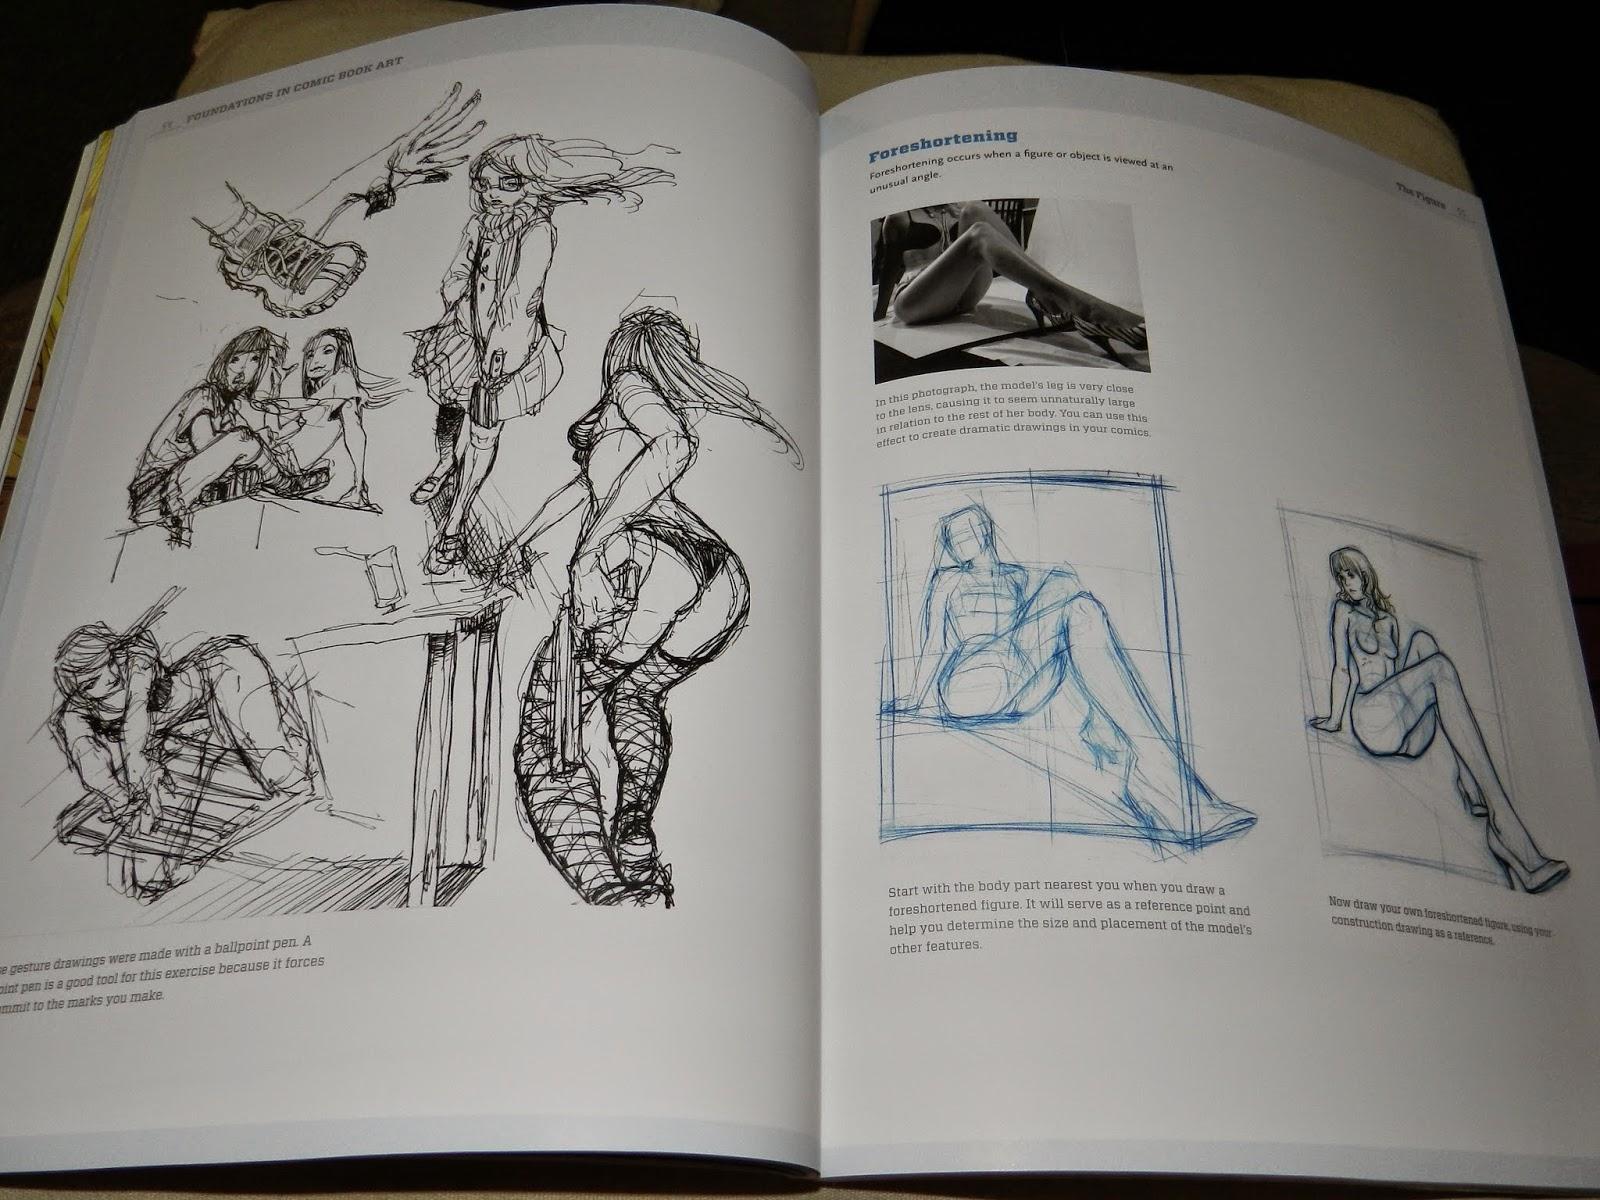 Comic book art critique rubric